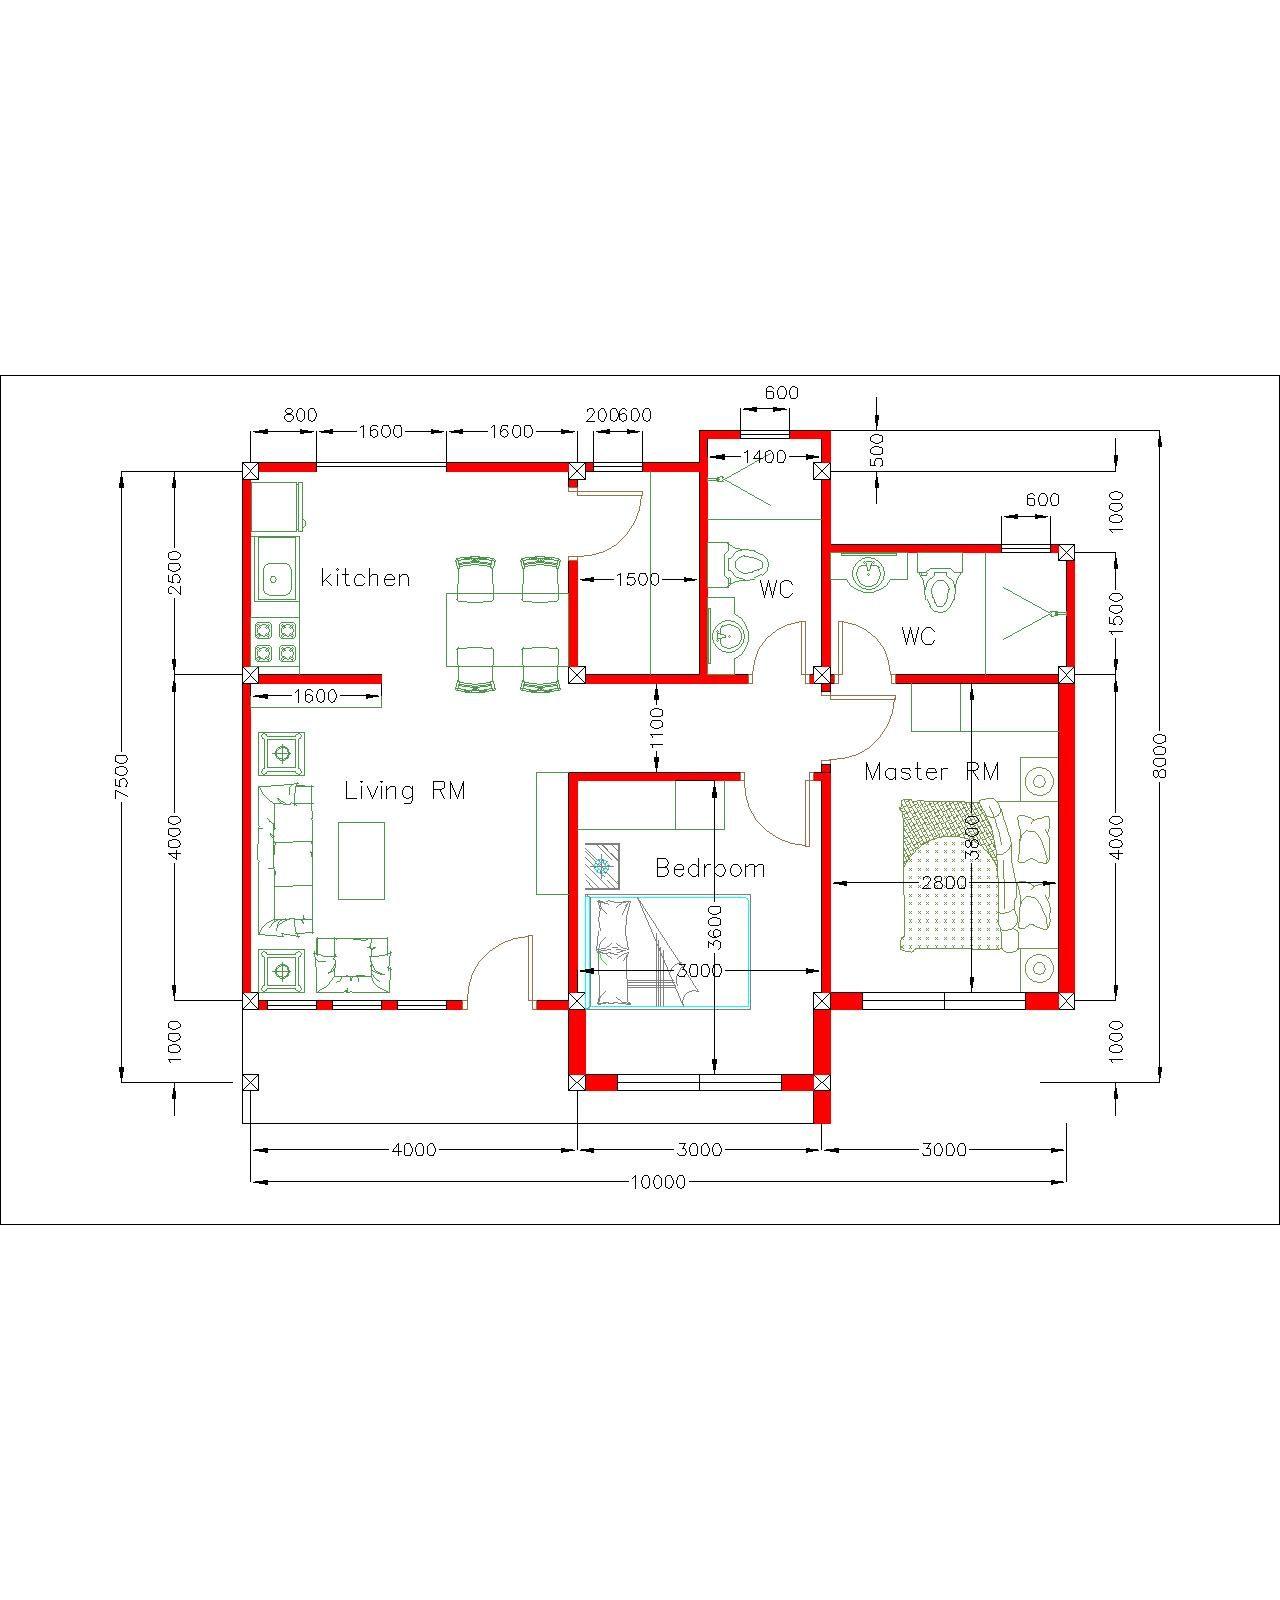 House layout floor plan